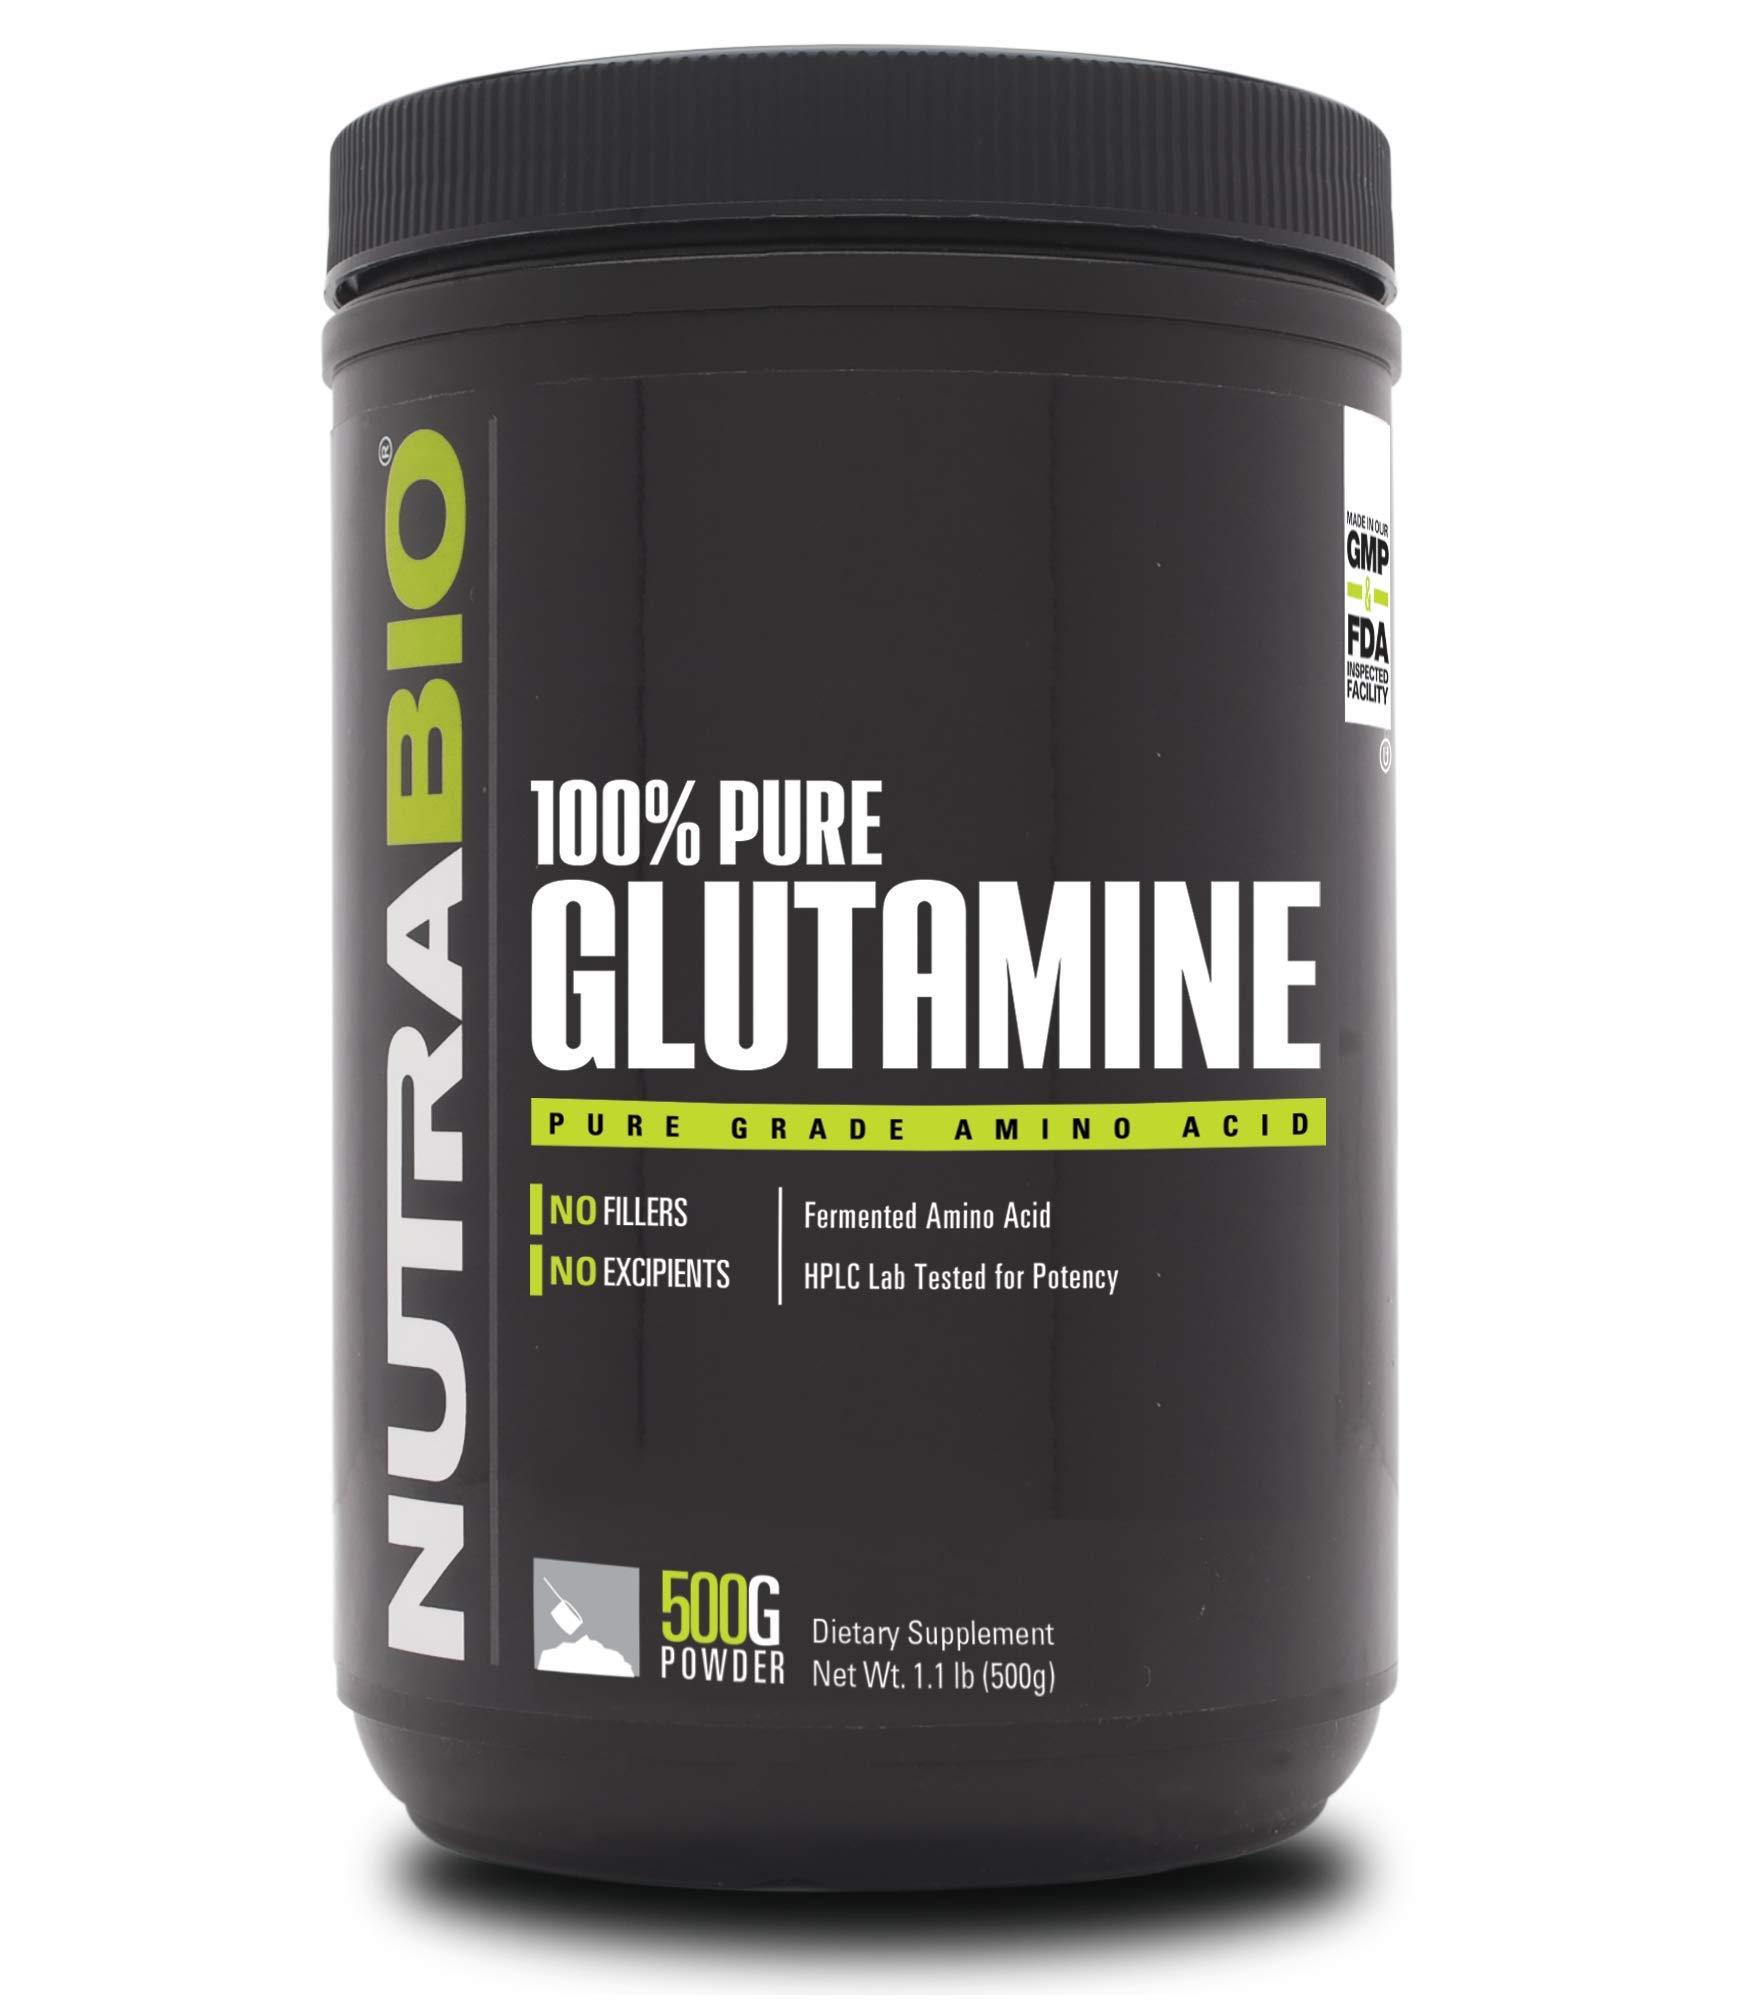 NutraBio 100% Pure L-Glutamine Powder - 500 Grams by NutraBio